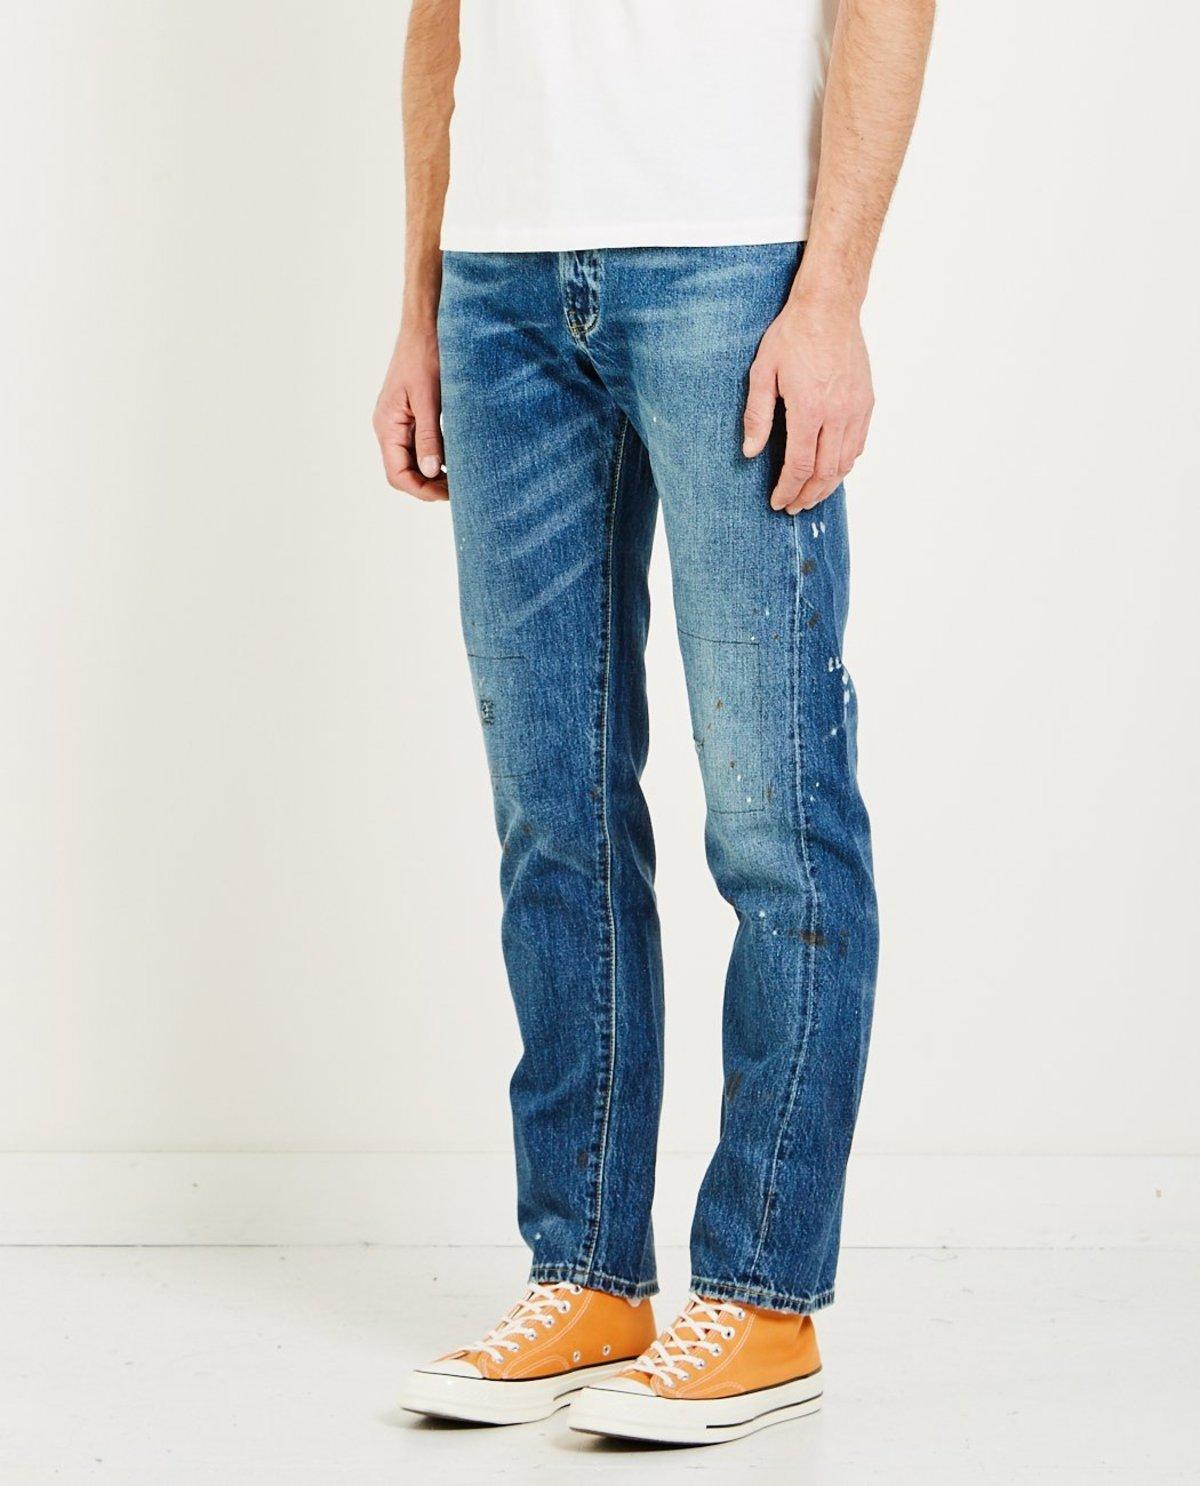 305da41f Levi's Vintage Clothing 1954 501 JEAN - LITTLE OBIE | Garmentory